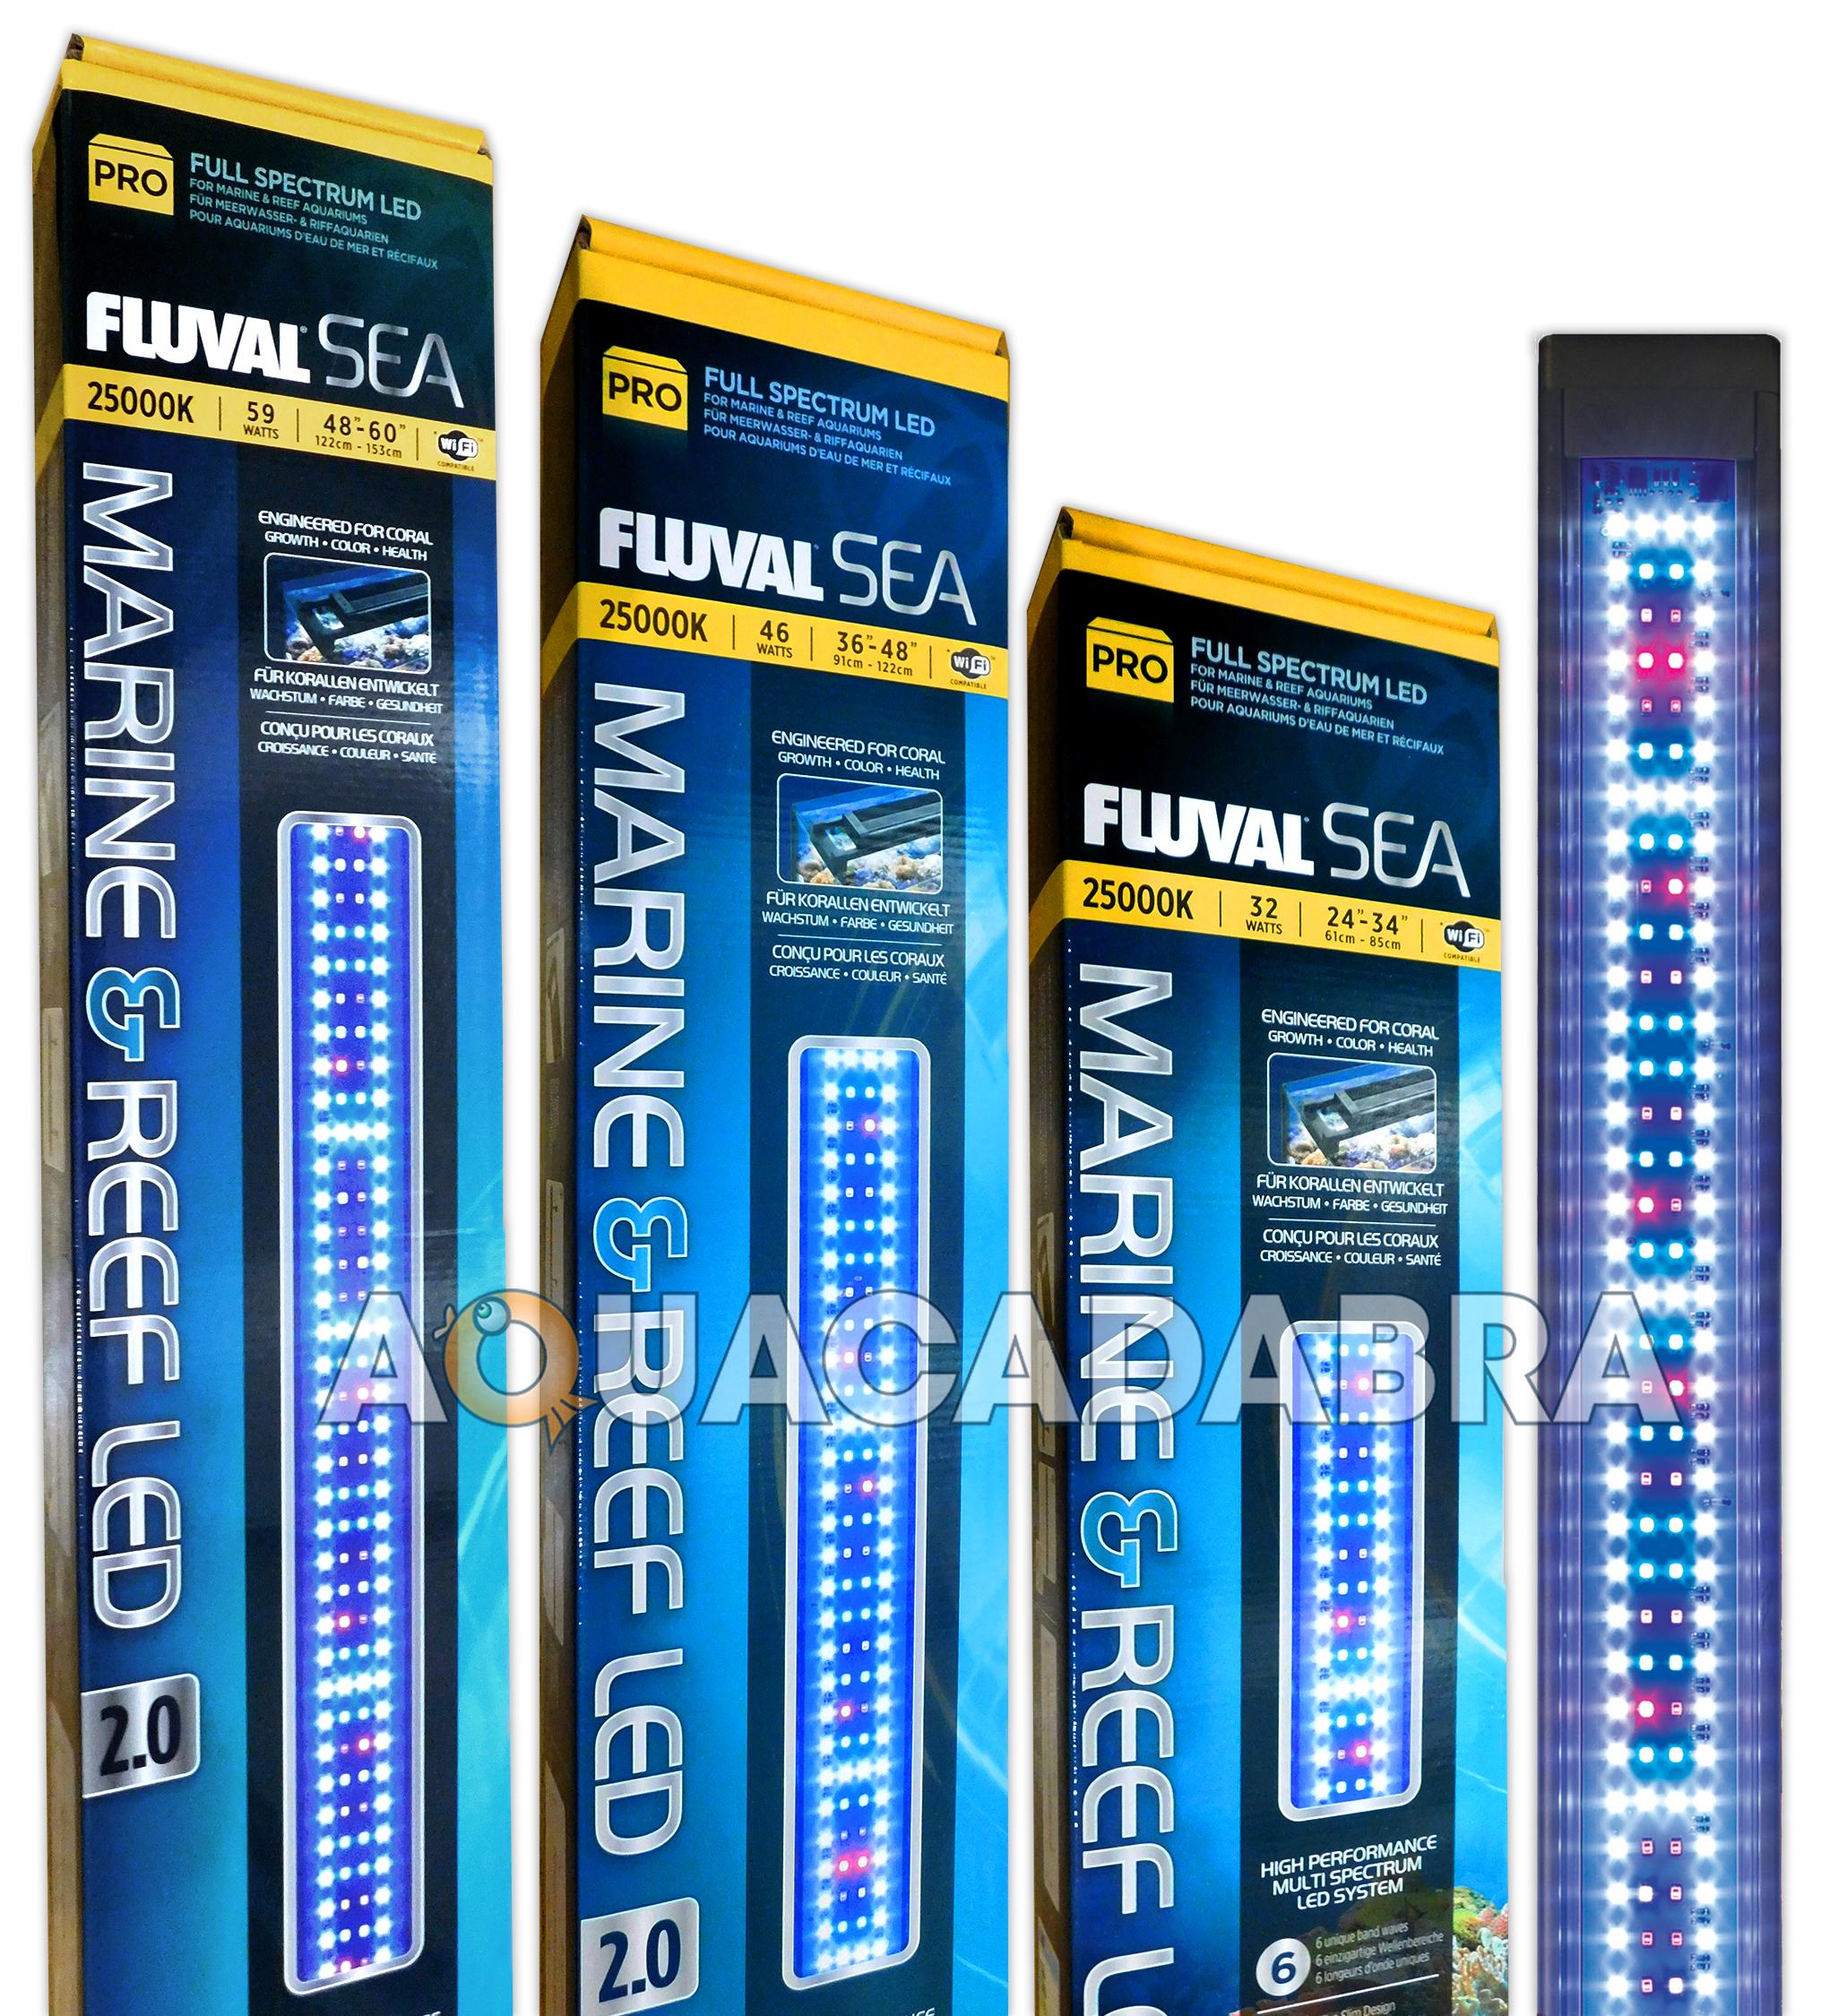 Fluval A3993 Sea marine und Reef 2.0 LED günstig kaufen | eBay